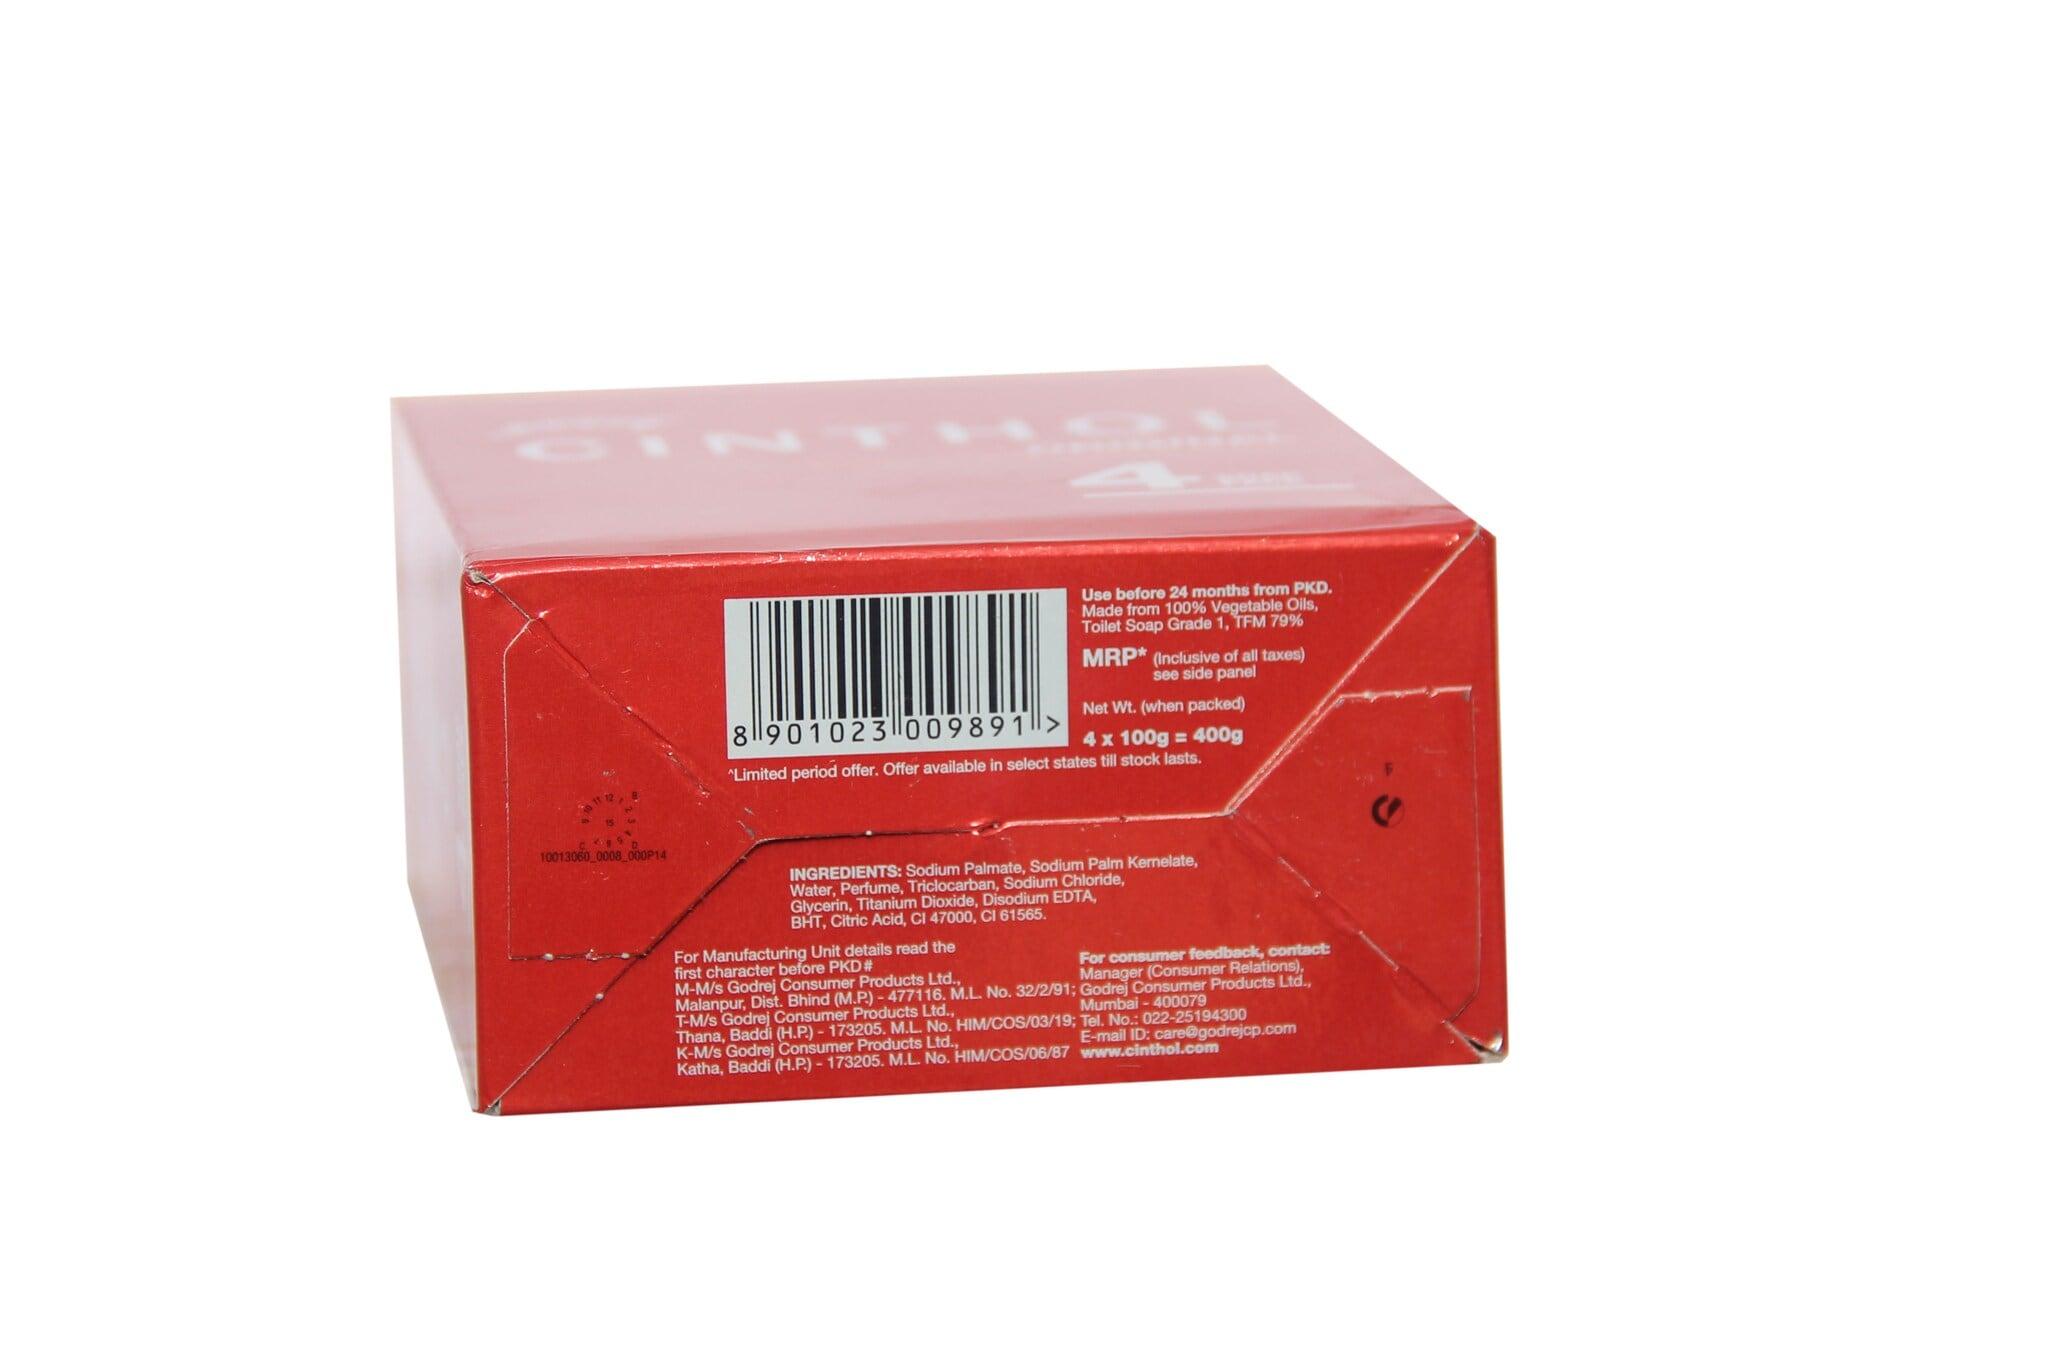 Godrej Cinthol Original Soap (Pack Of 4)